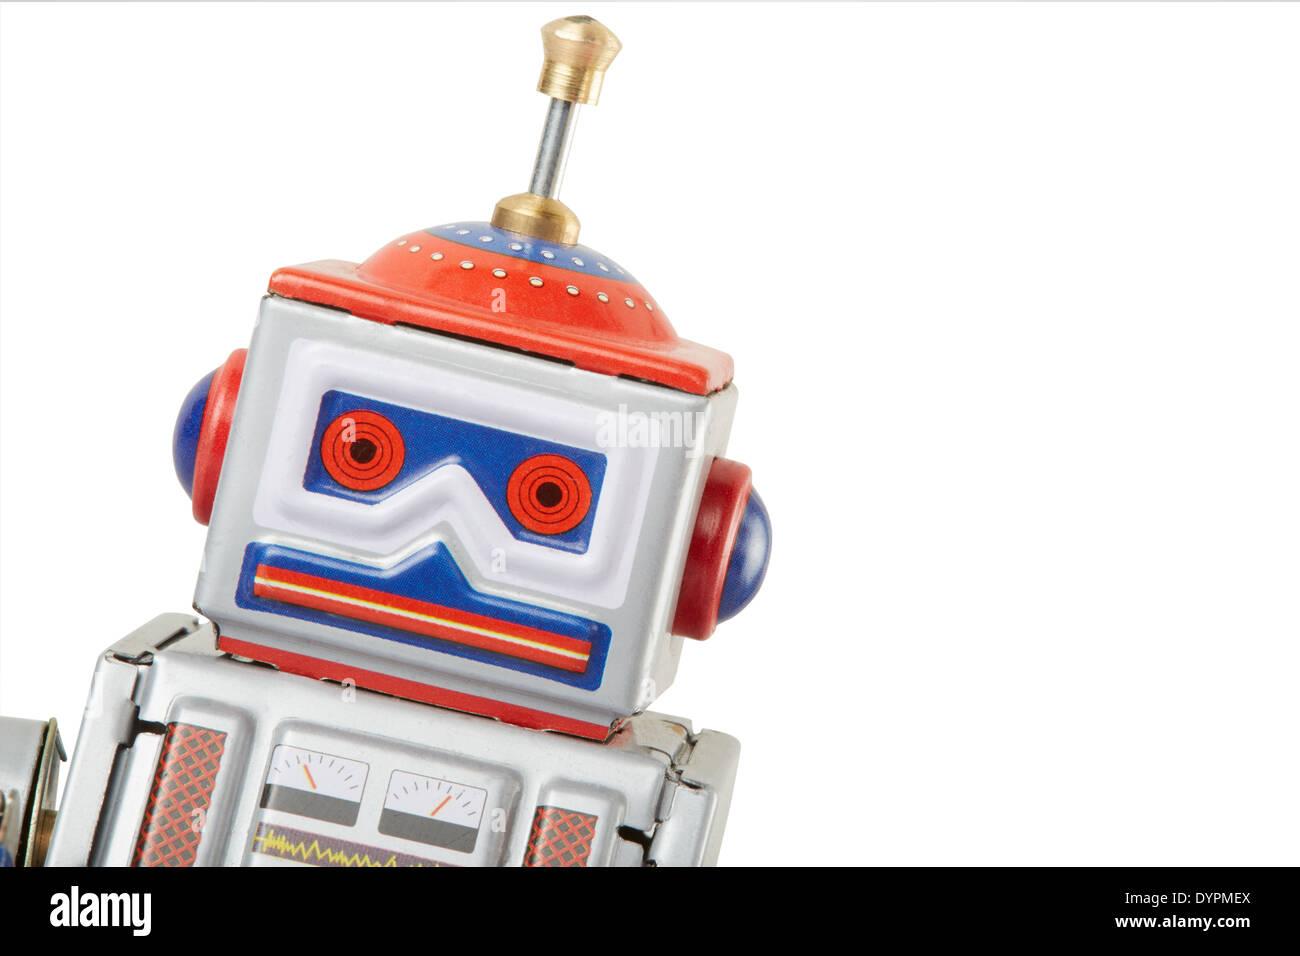 Robot vintage toy - Stock Image